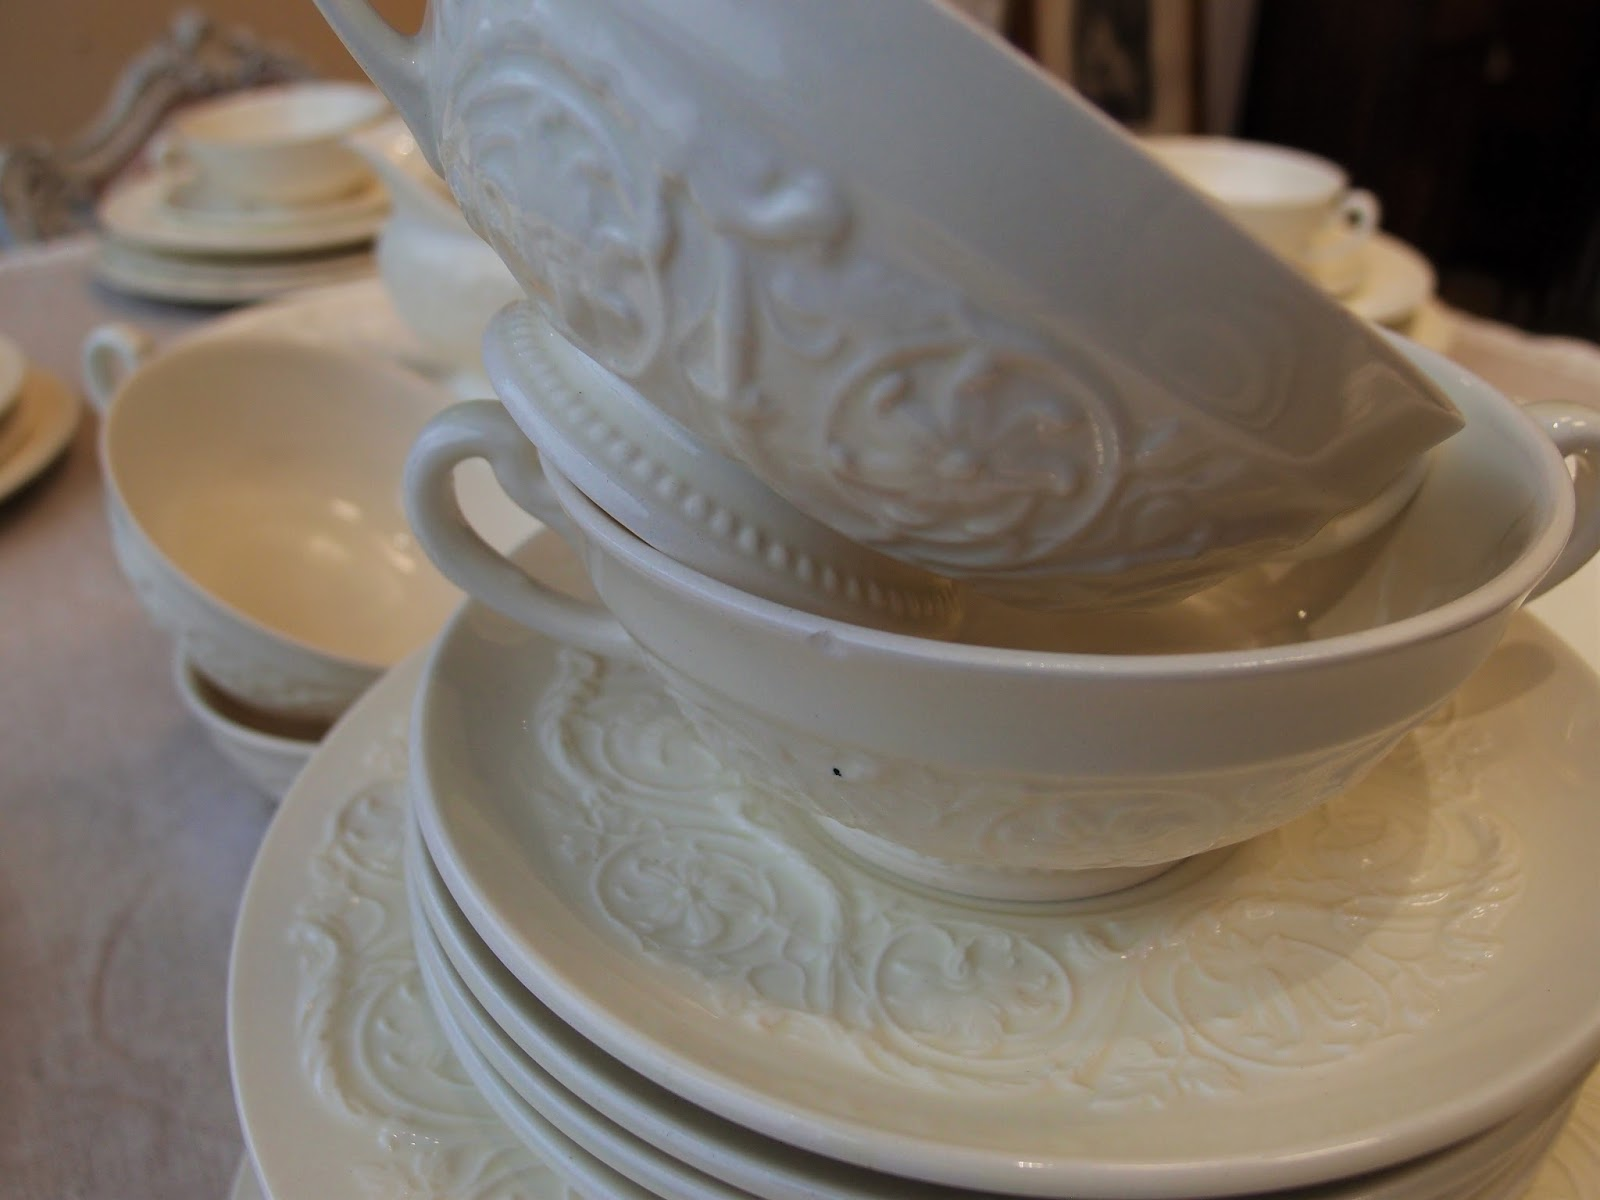 Servizi da tavola antichi porcellane inglesi antiche